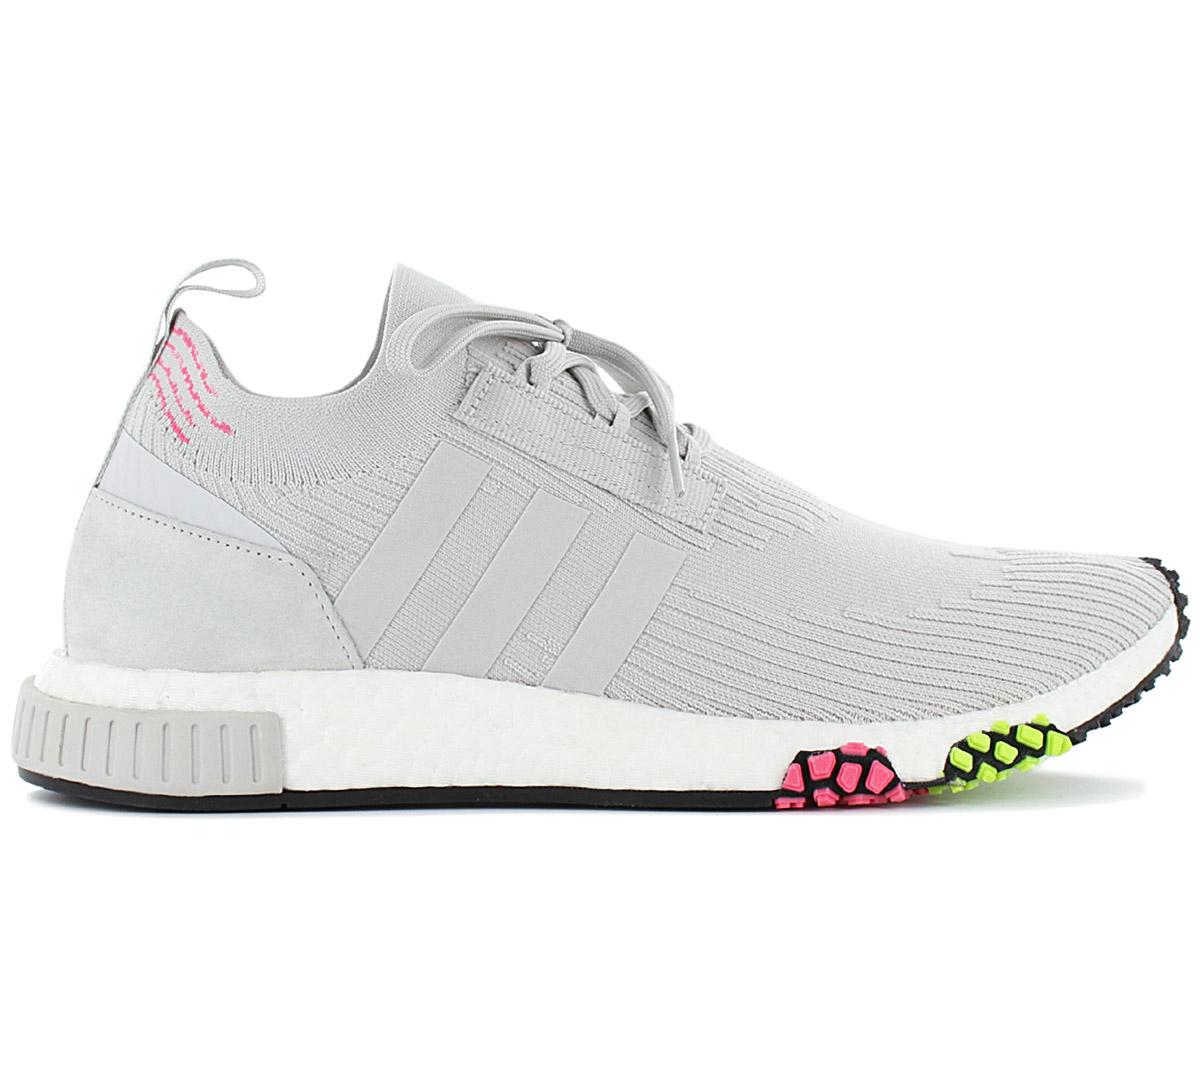 Details about Adidas Originals Nmd Racer Pk Primeknit Men's Sneaker CQ2443 Shoes Sneakers